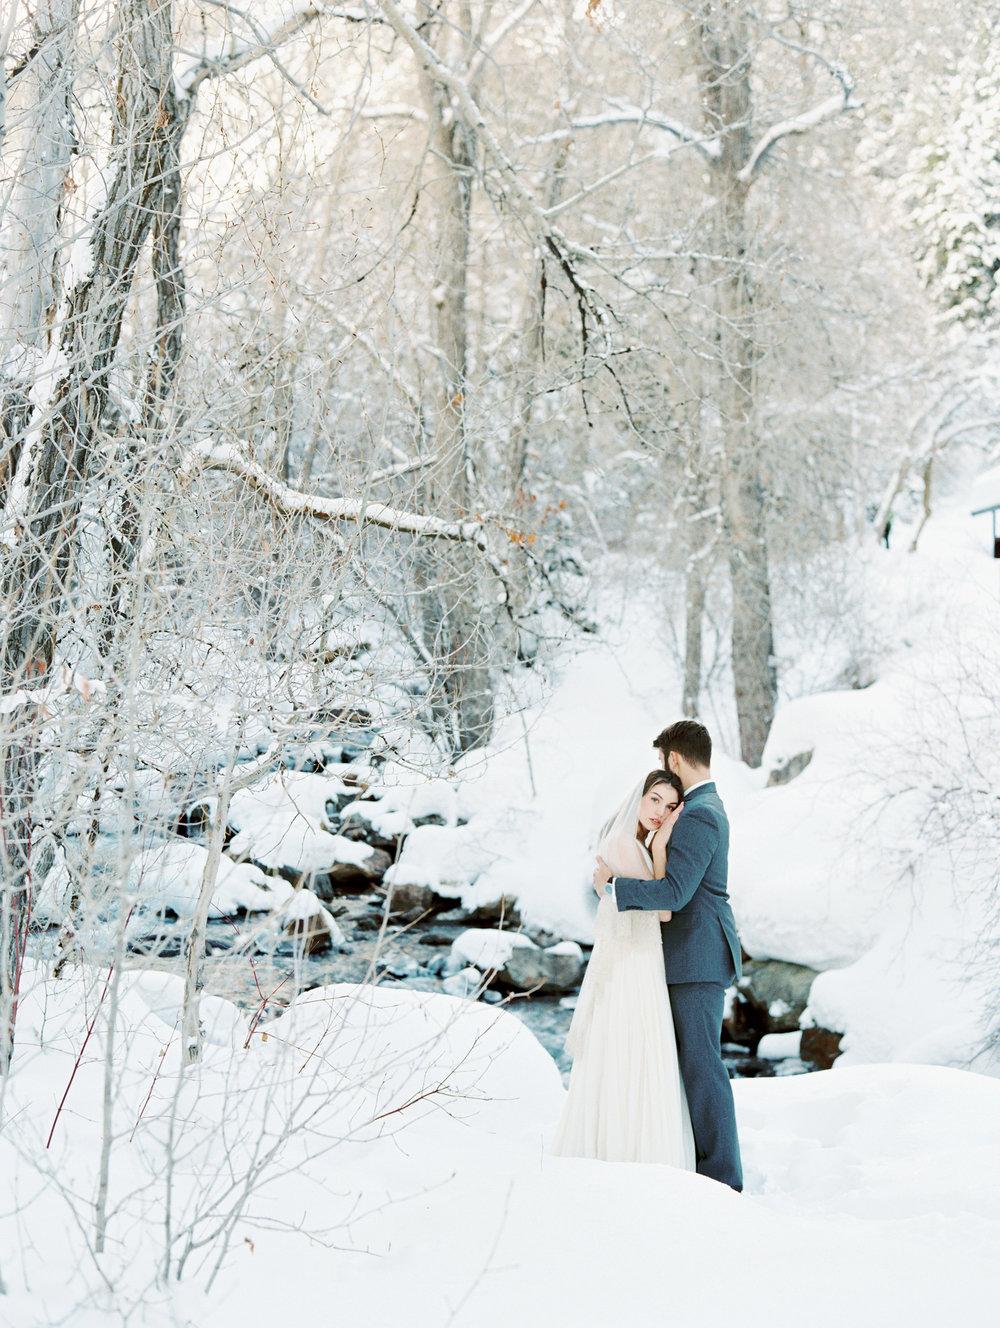 BellaCosa_WinterWonderland-102.jpg